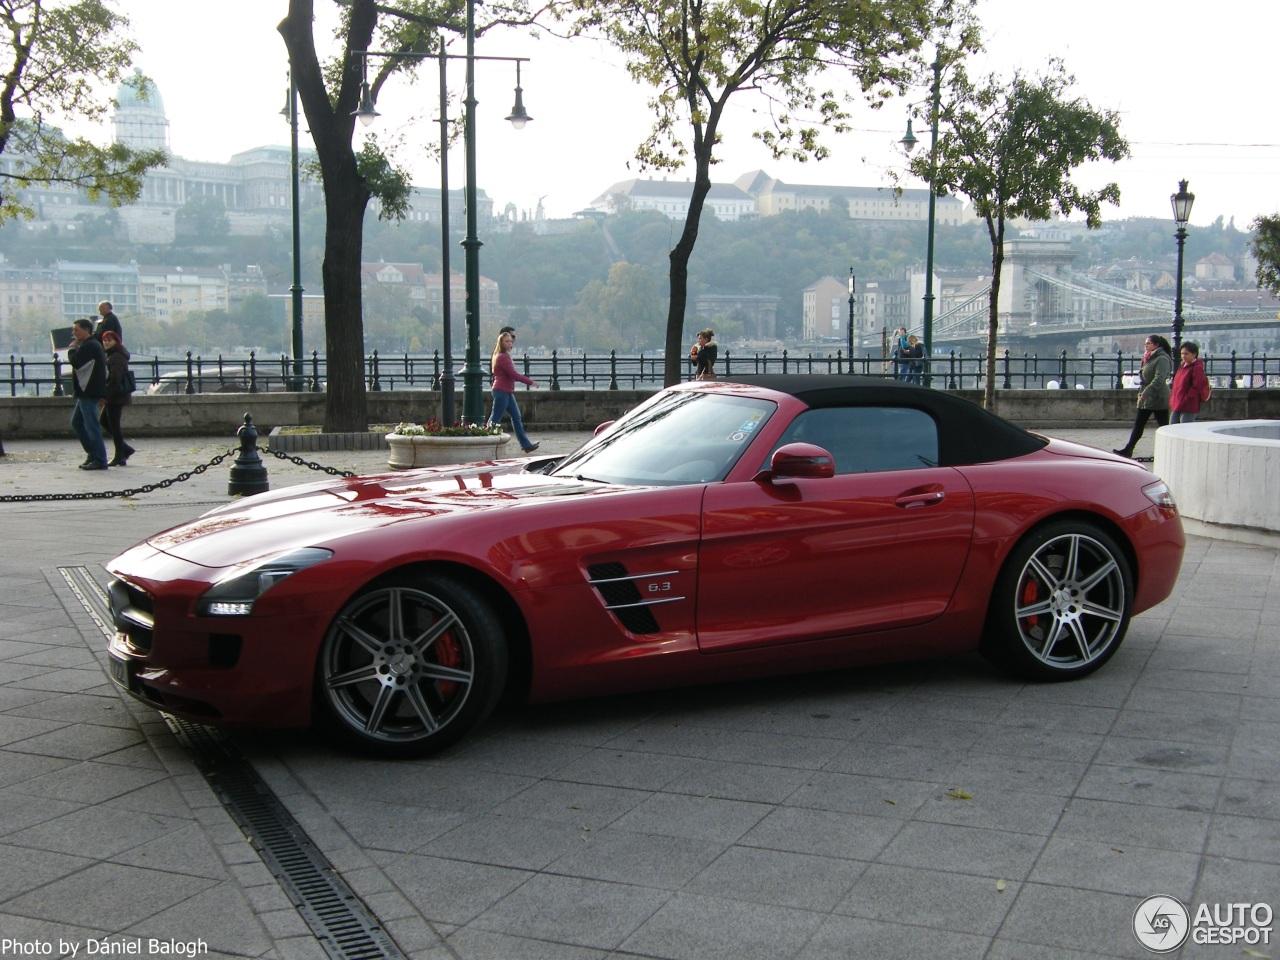 Mercedes benz sls amg roadster 27 oktober 2015 autogespot for 2015 mercedes benz sls amg convertible